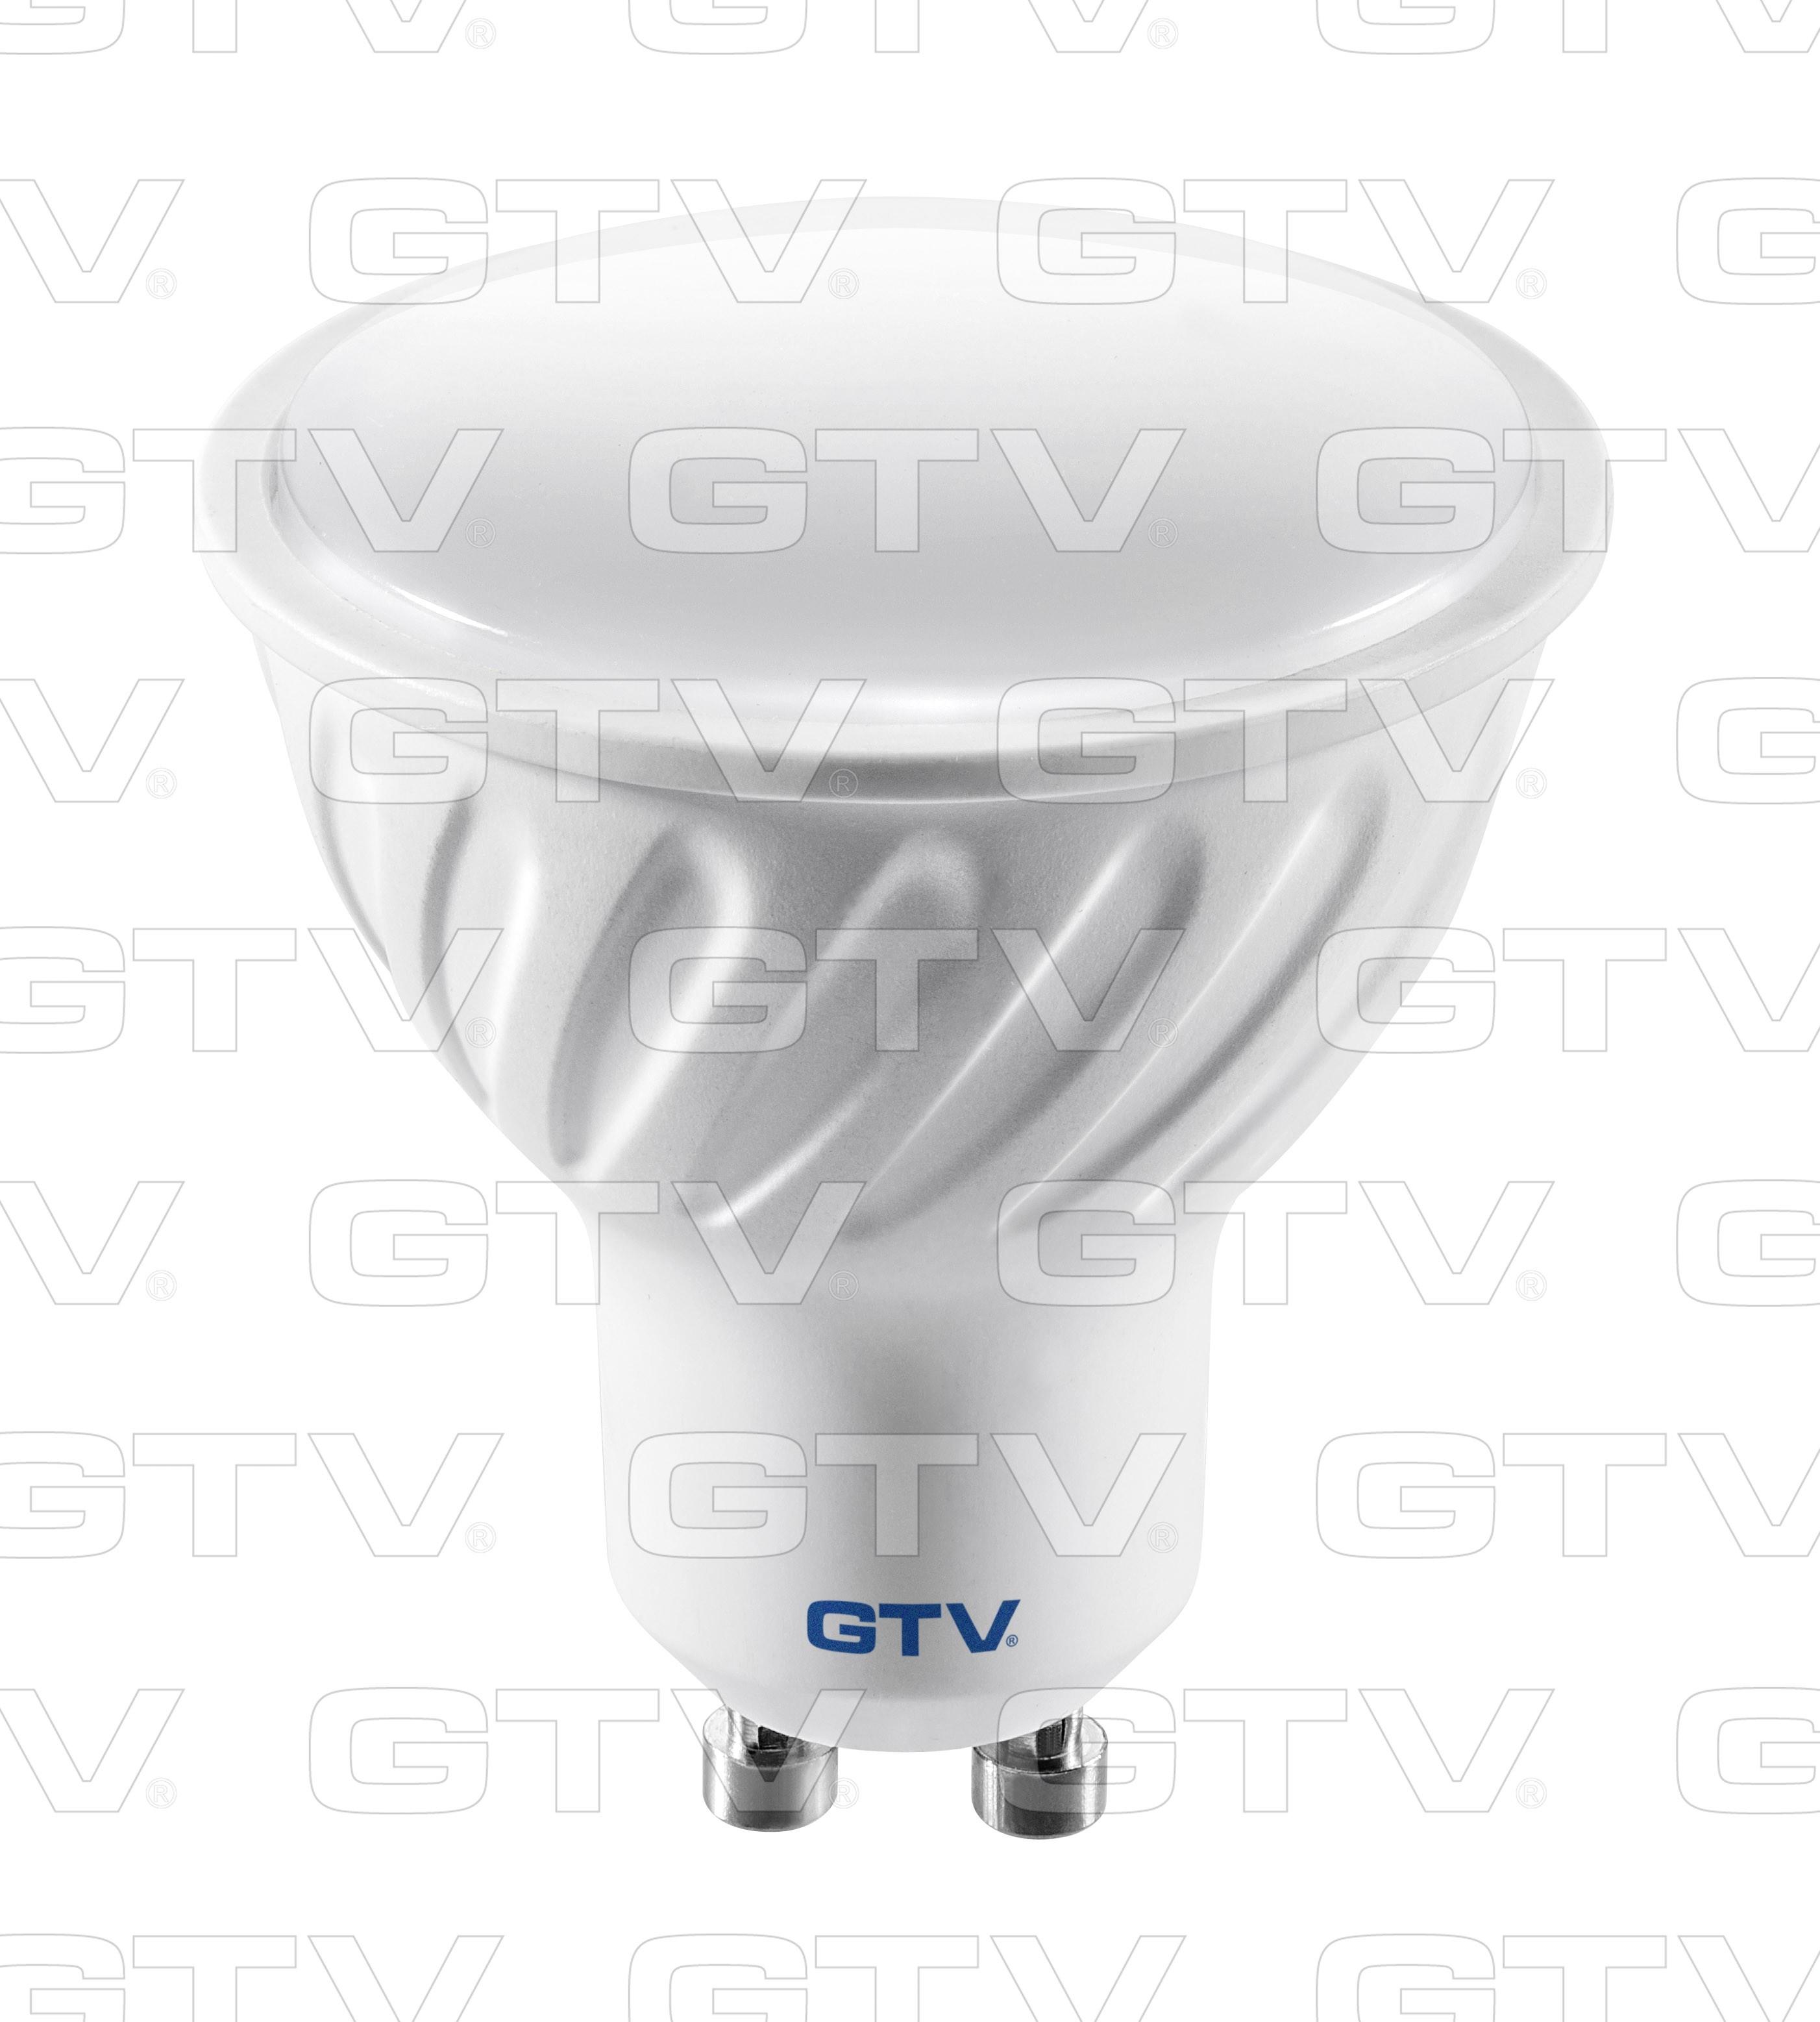 GTV Żarówka LED GU10 6W LD-PC6010-30